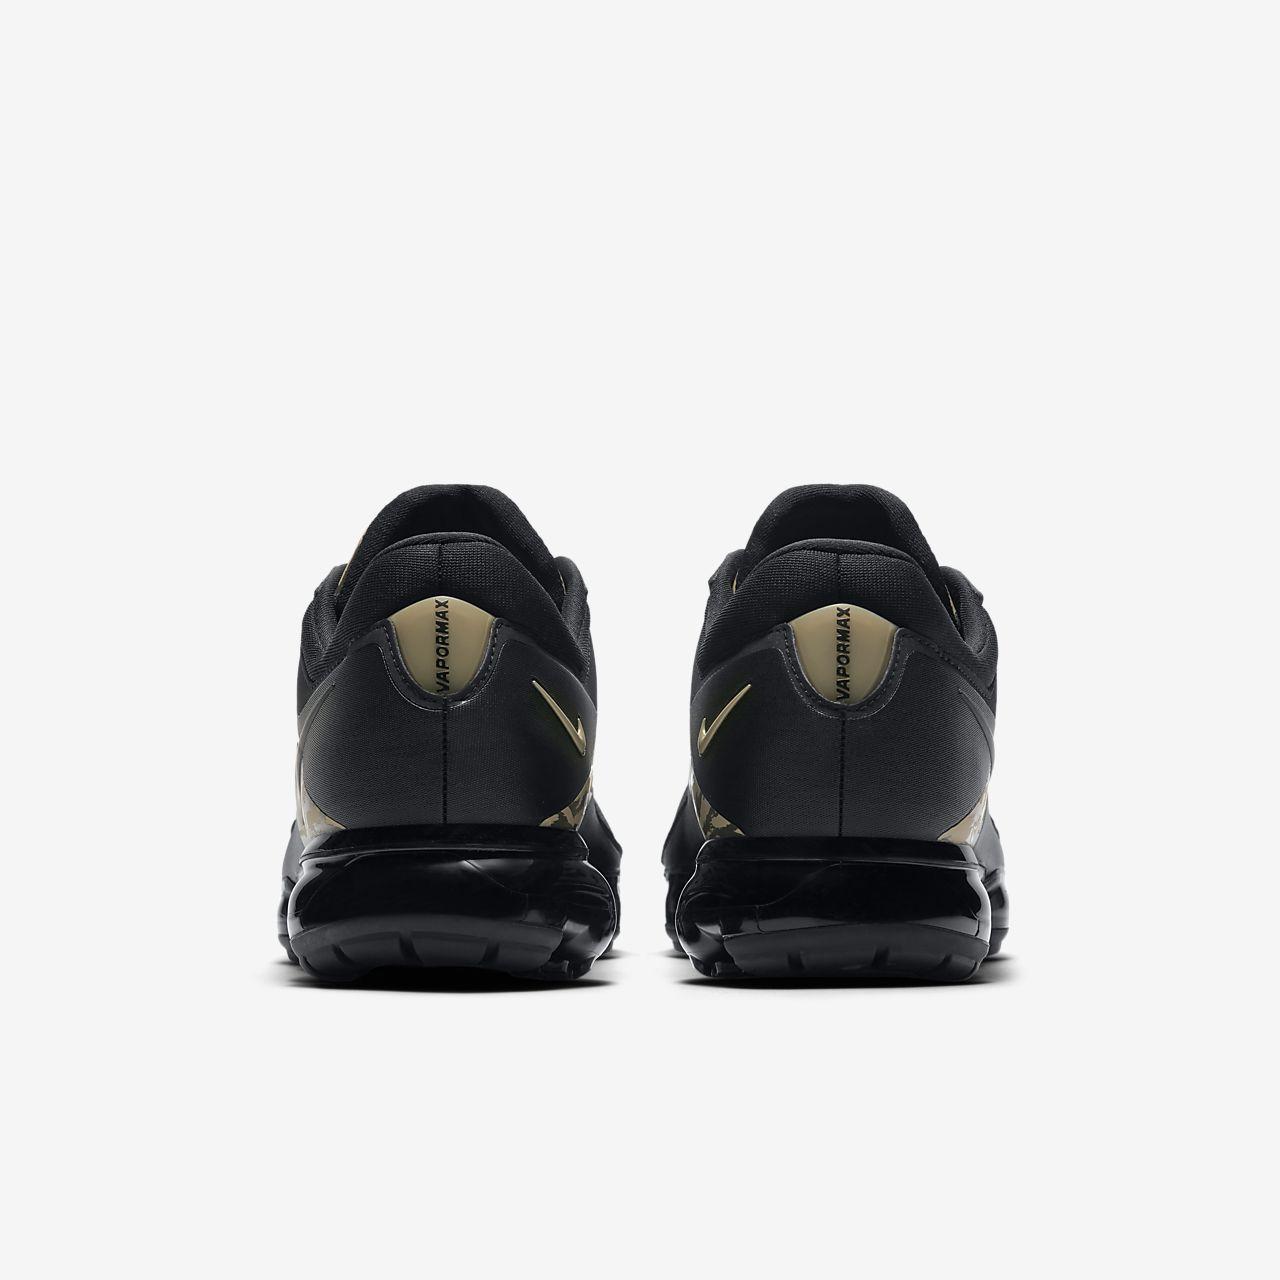 Nike Air VaporMax Herren-Laufschuh Herren-Laufschuh Herren-Laufschuh Mode Schuhe-AR1988DS   14b147